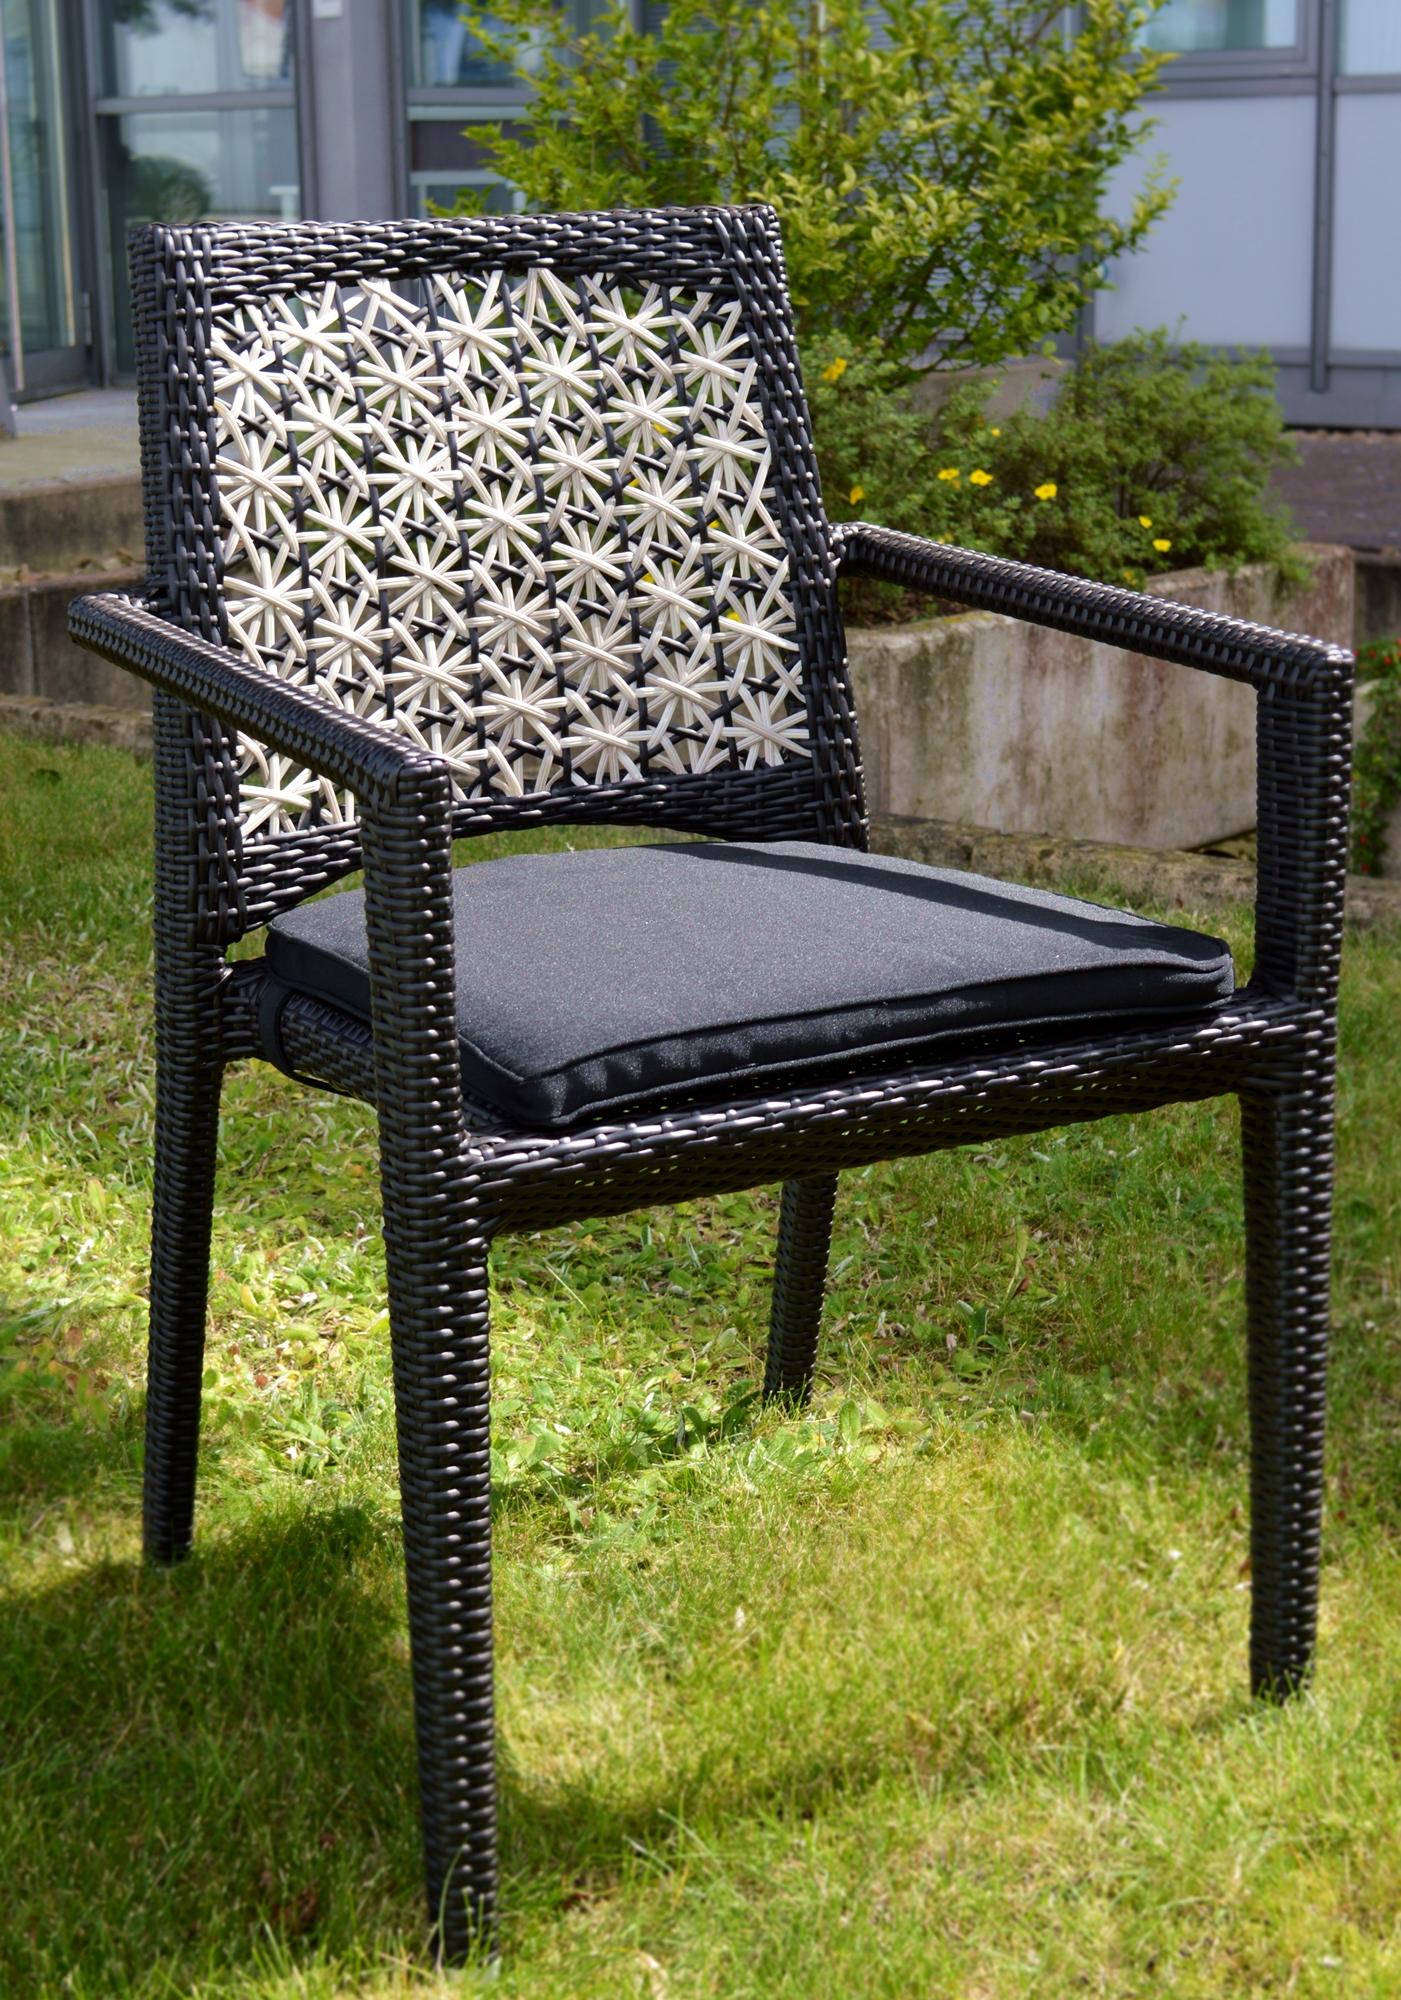 4er set geflecht gartenst hle fiorana inkl auflage von garvida gartenm bel st hle sessel. Black Bedroom Furniture Sets. Home Design Ideas